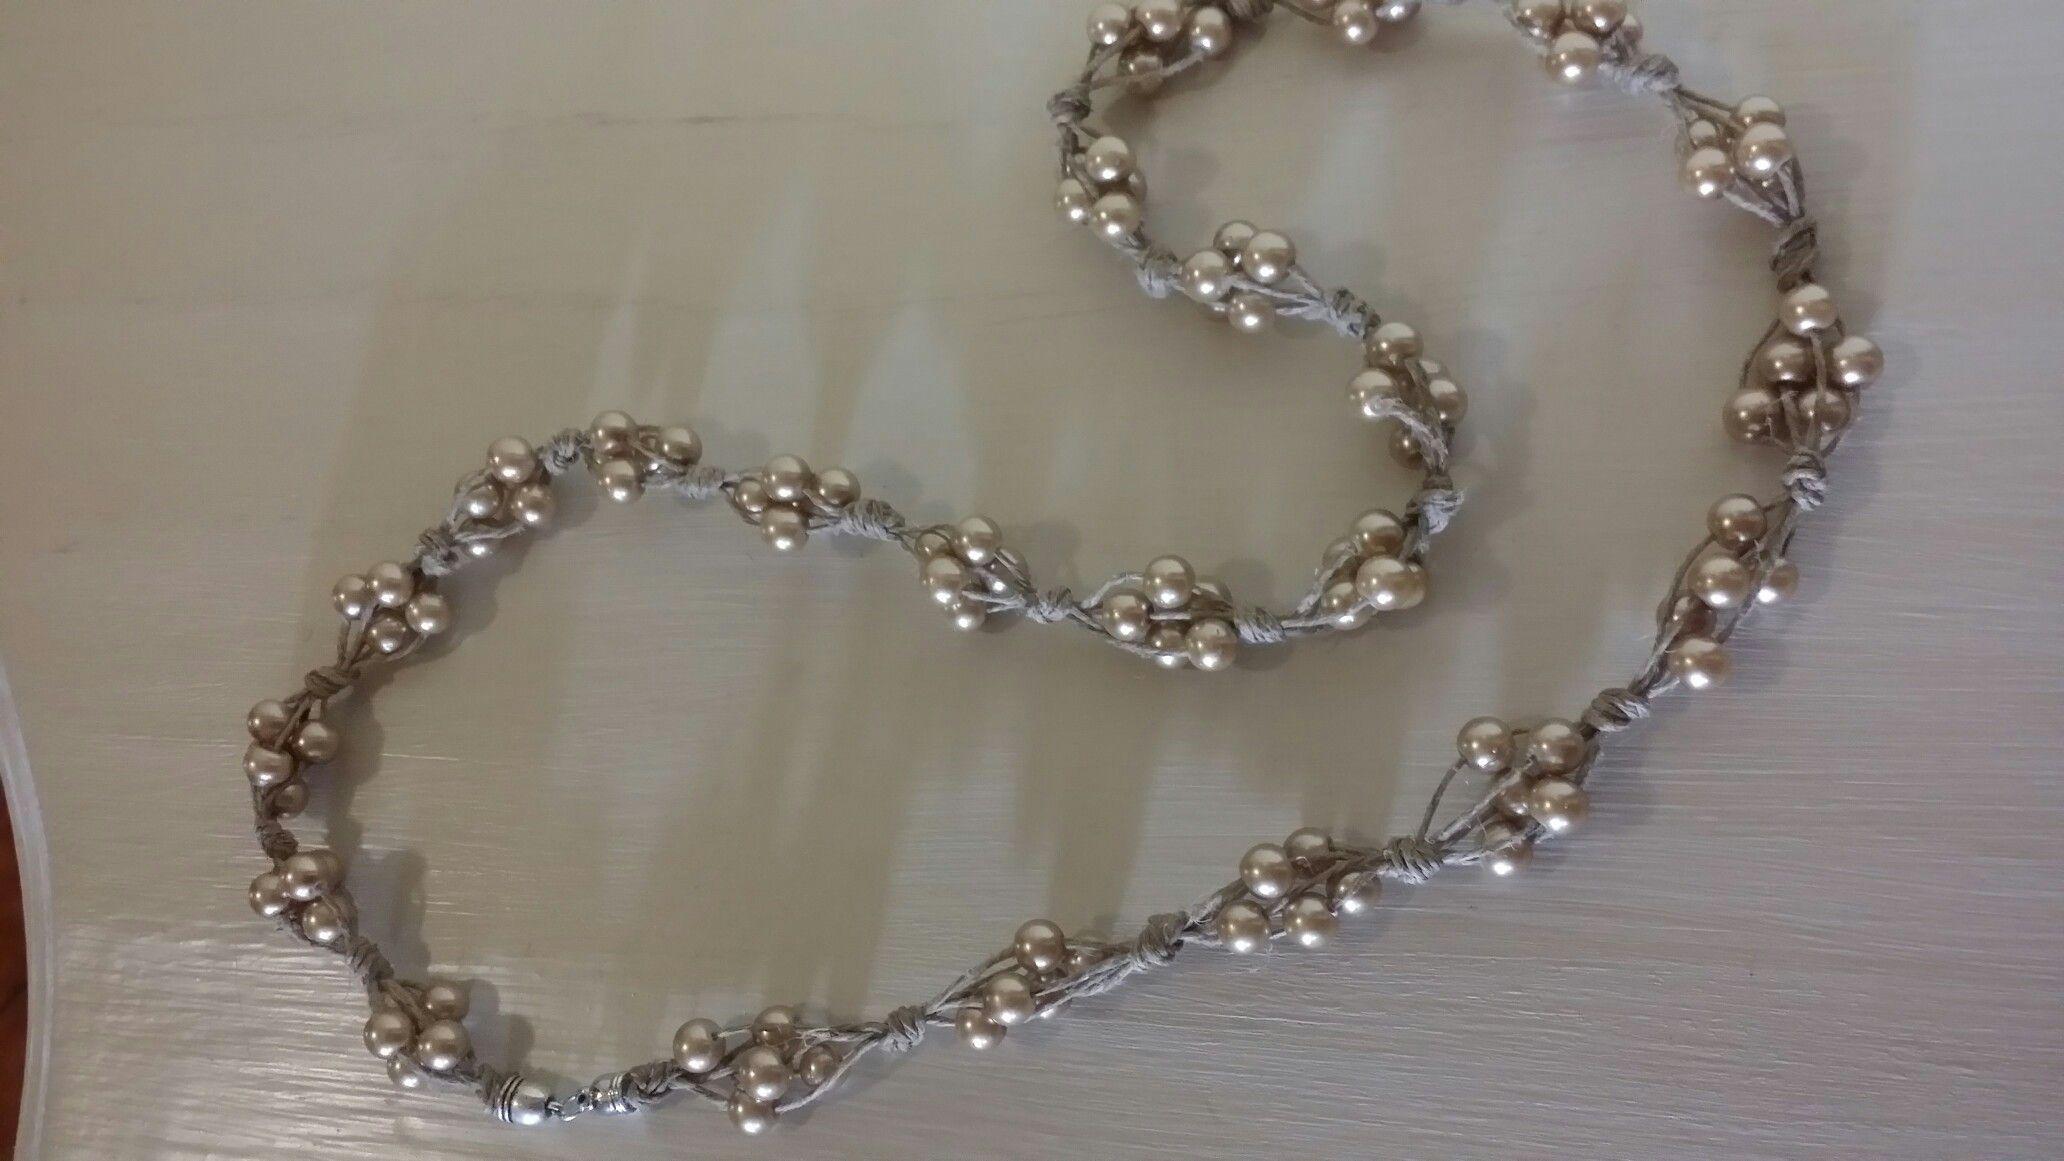 outlet 0c537 9fcdf Collana spago e perle   uncinetto filo metallico   Perle ...